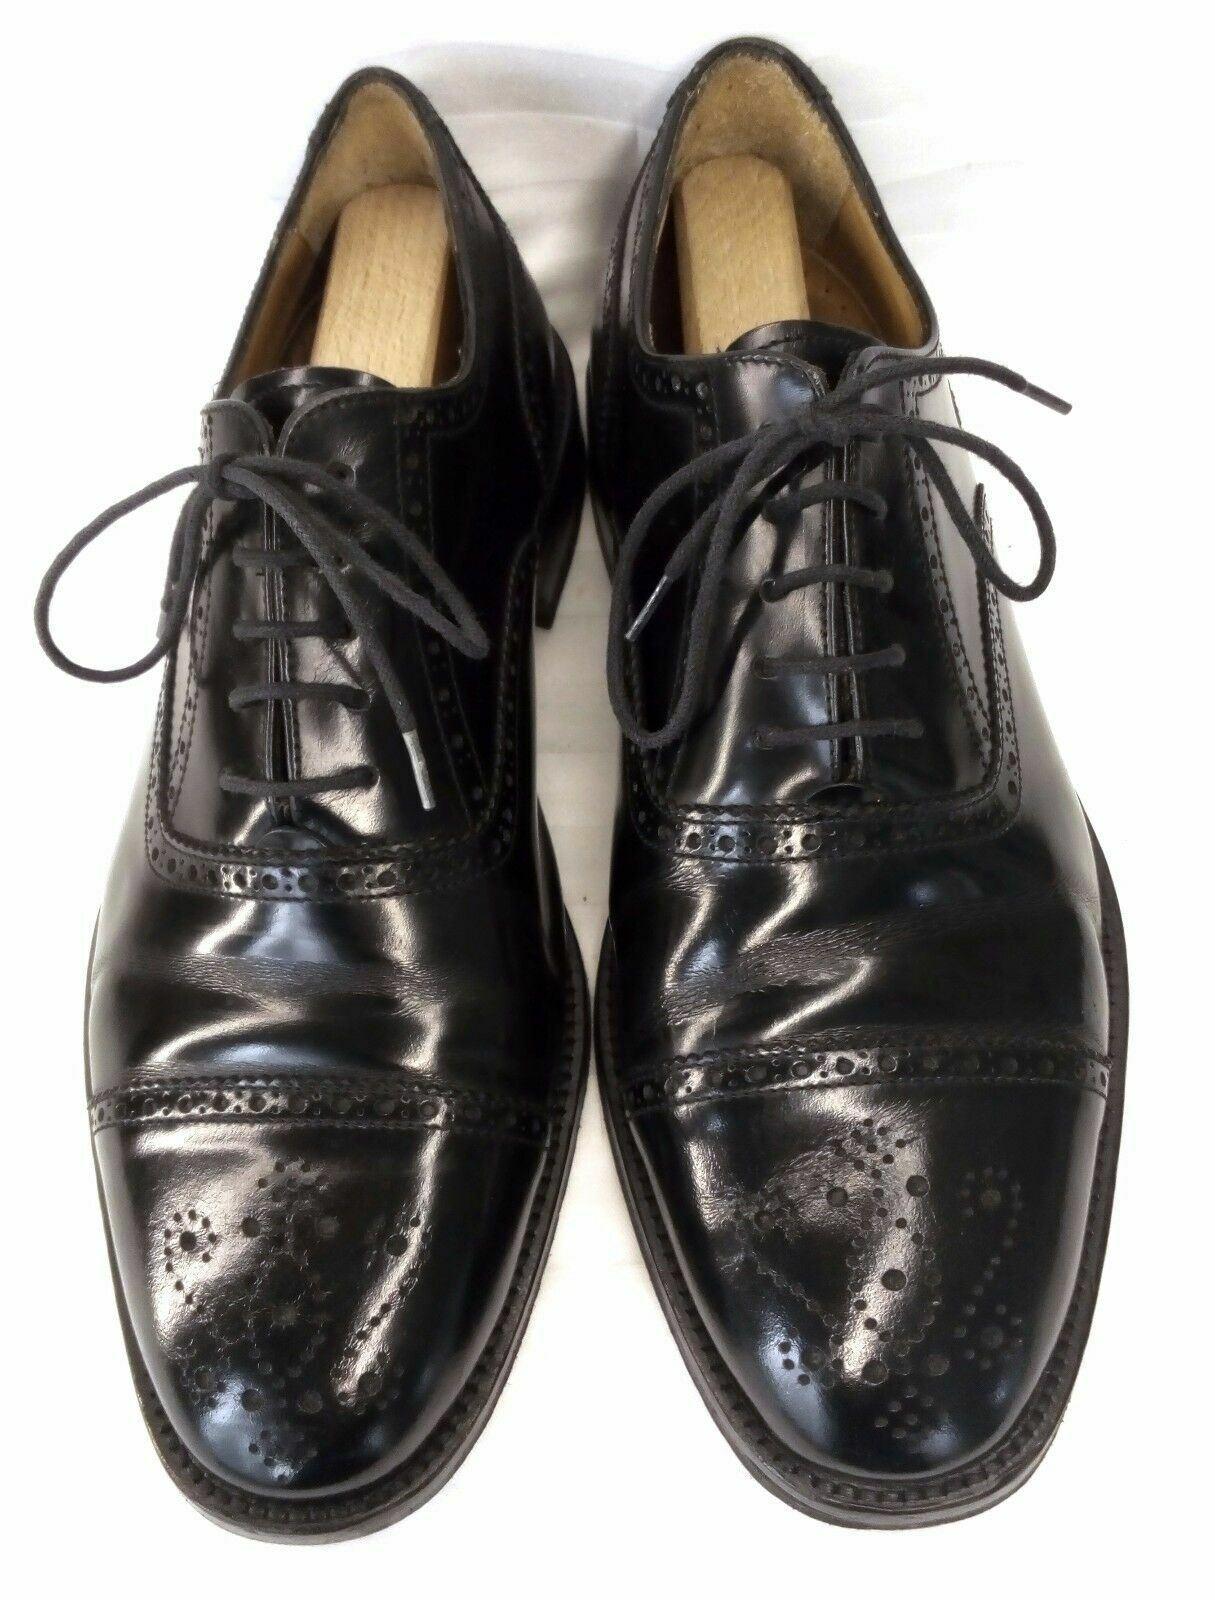 Gaastra Damen Schuhe Vergleich Test +++ Gaastra Damen Schuhe